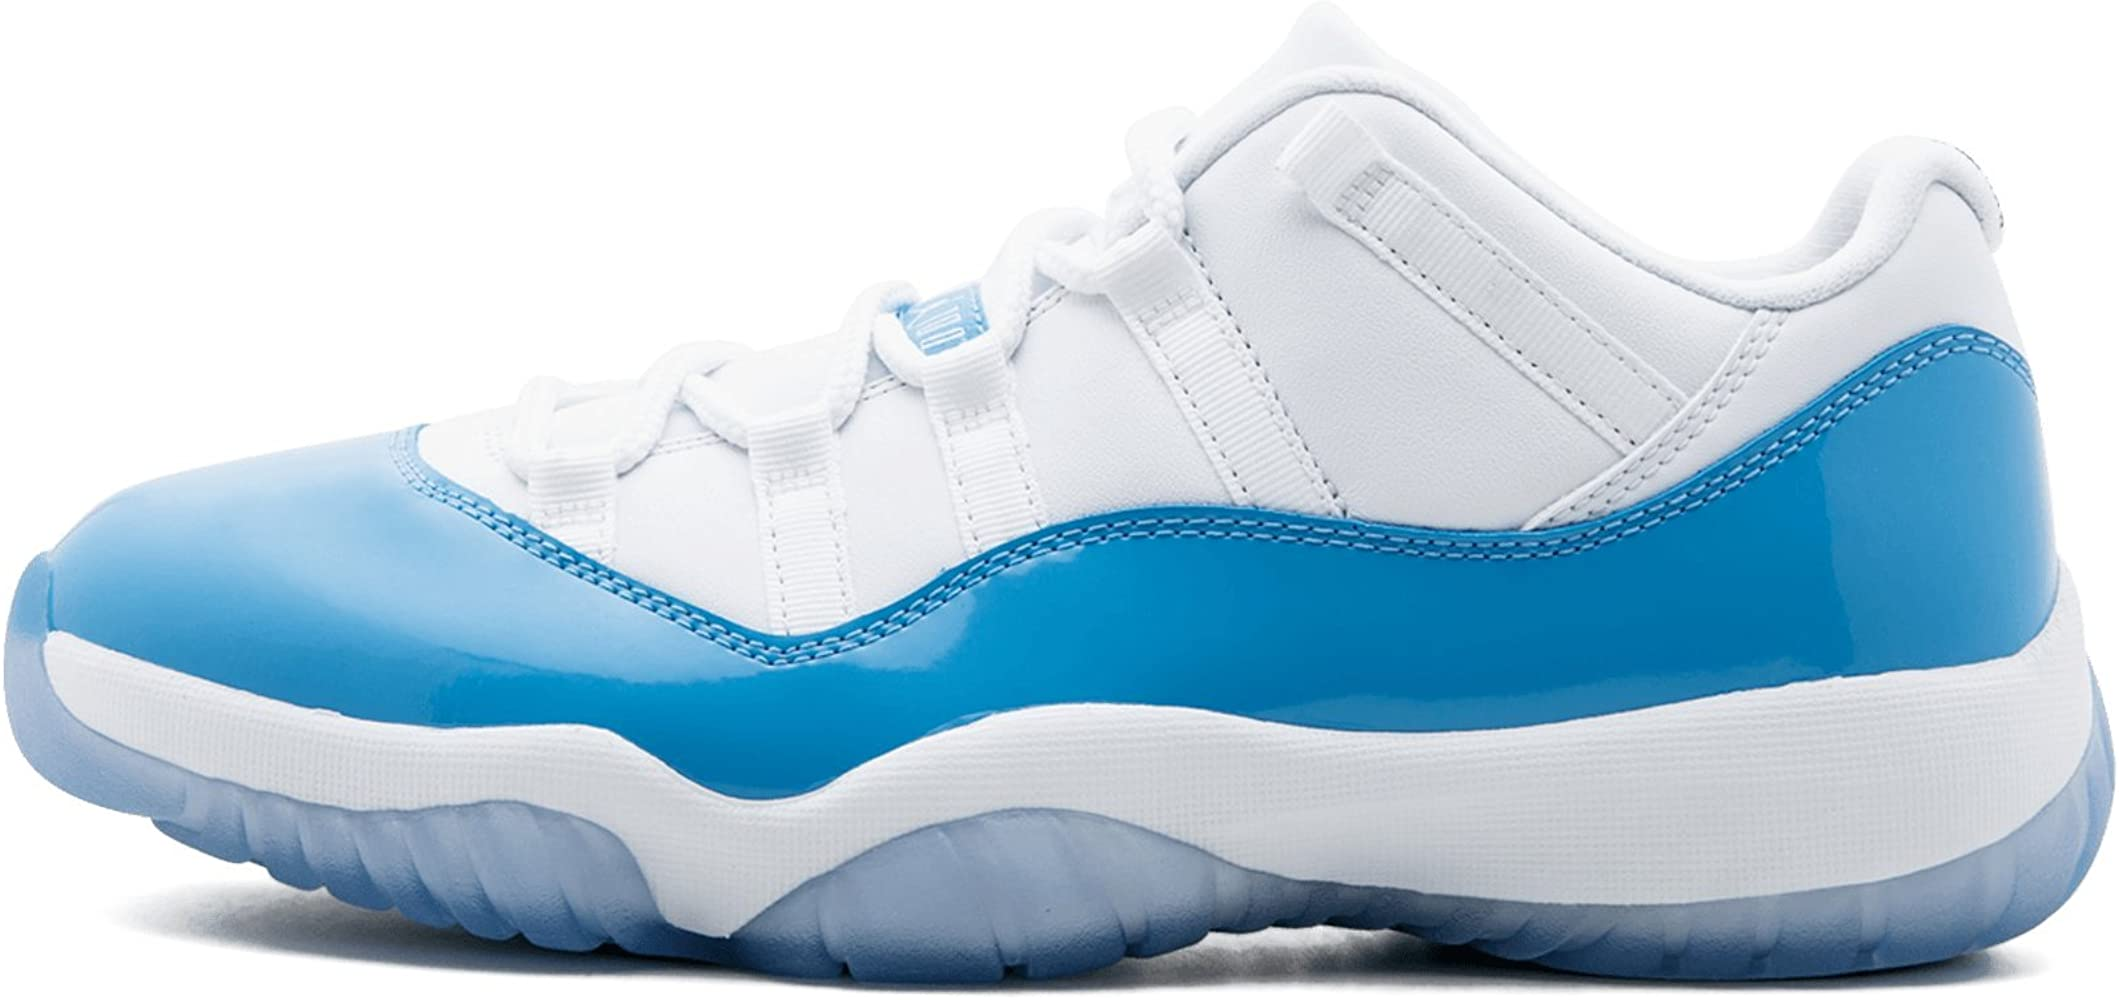 timeless design 8bd11 91b64 Men Air Jordan 11 Retro Low (White/University Blue) Size 9.5 US